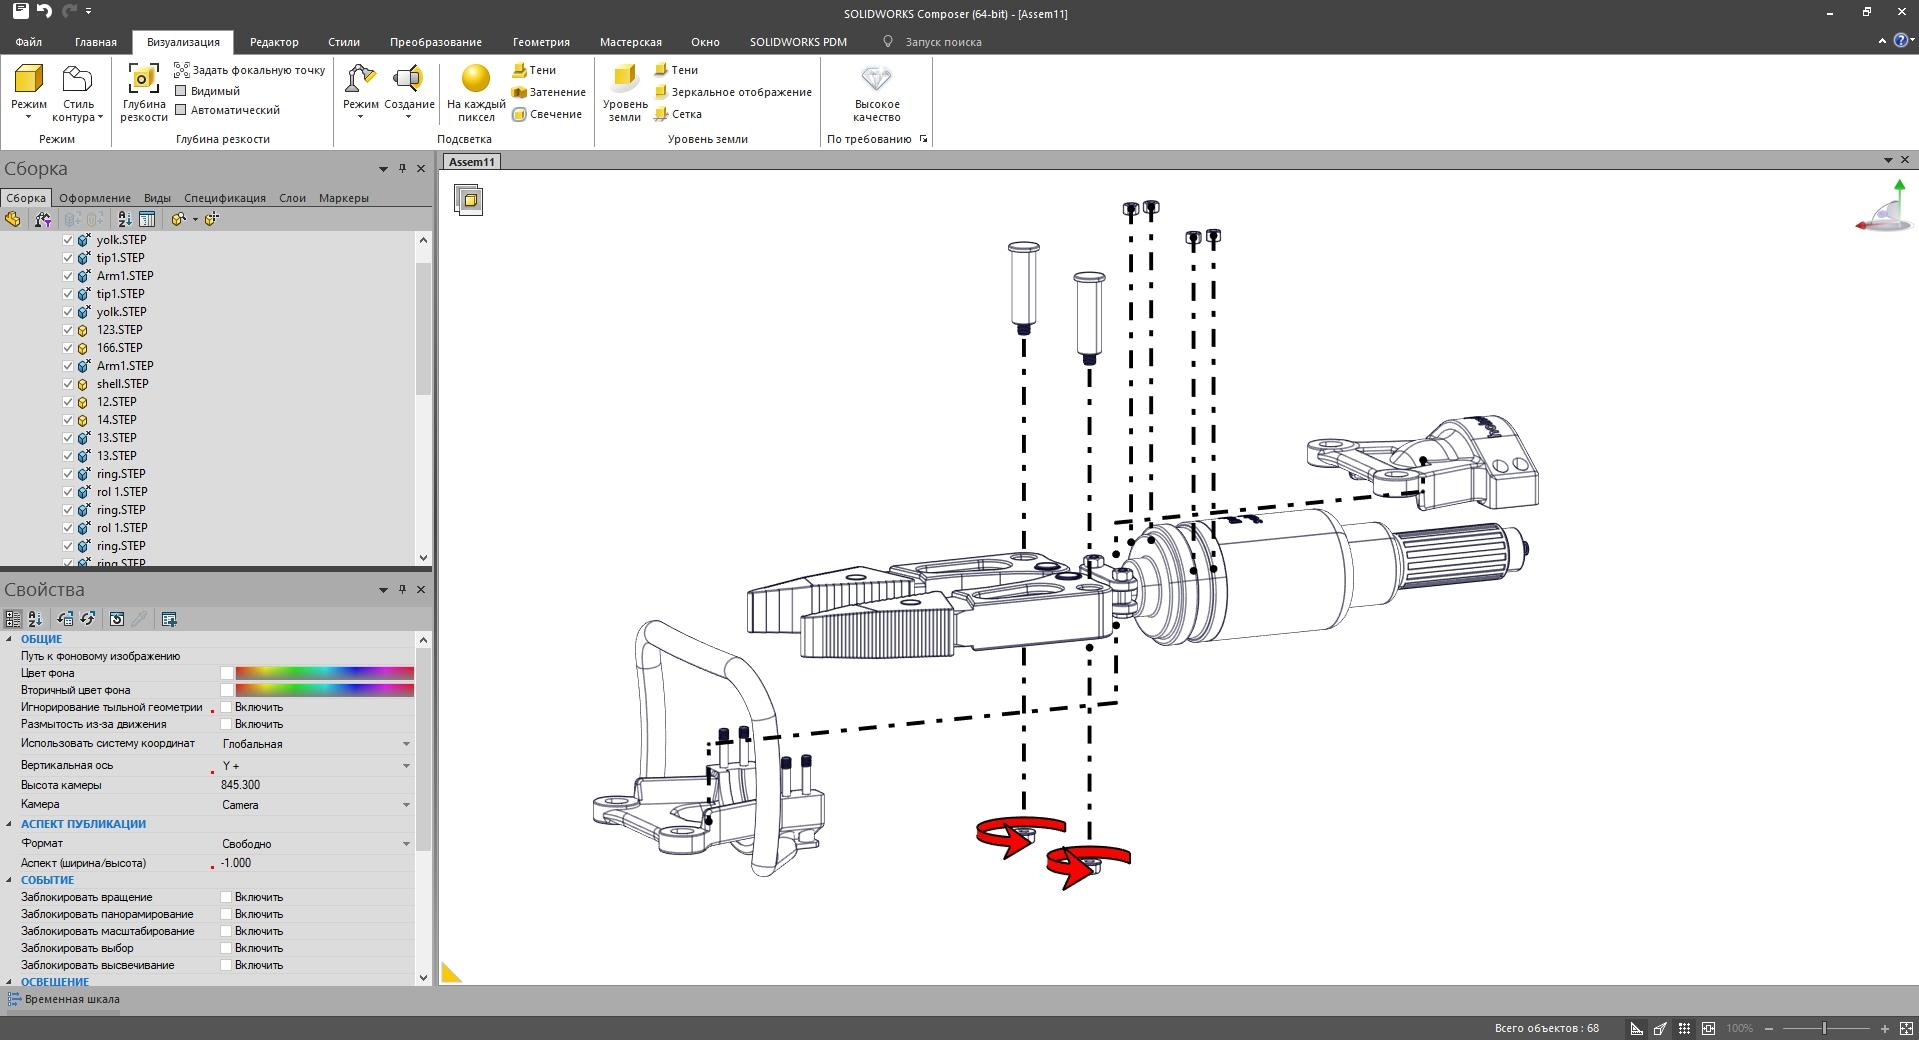 SolidWorks Composer, SolidWorks визуализация, гидравлические ножницы в Composer, SolidWorks чертежи